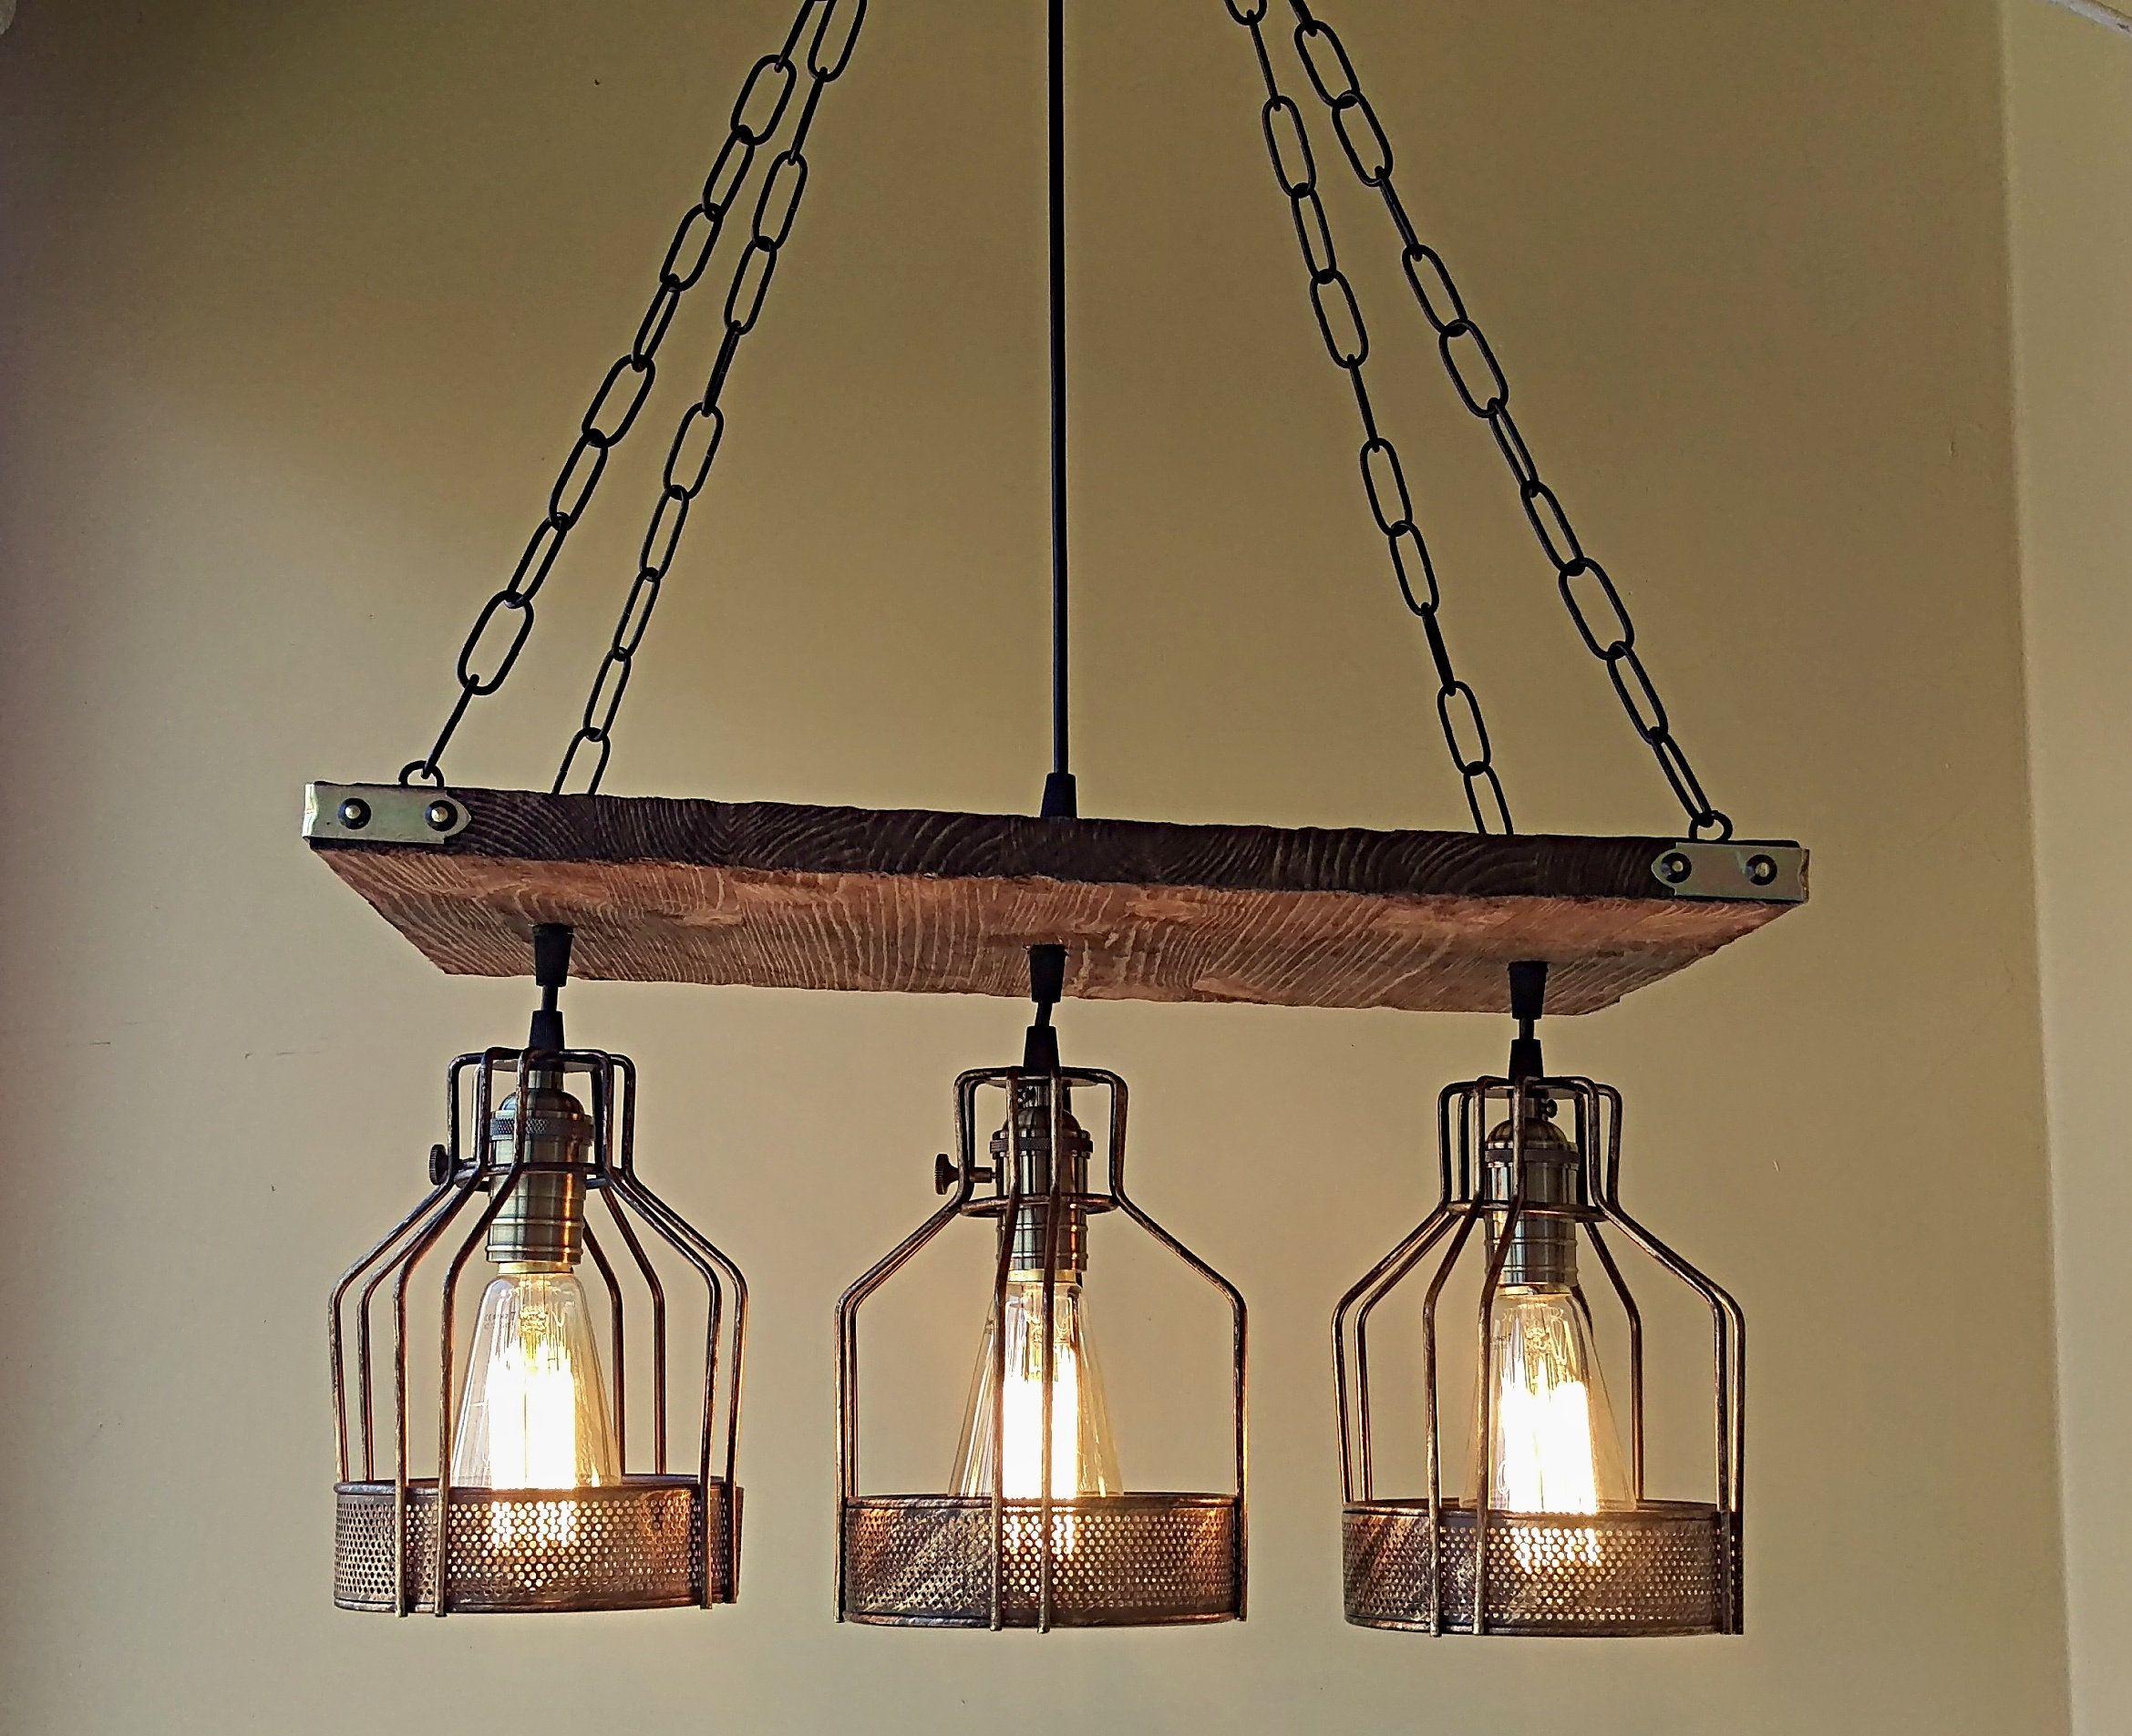 Ceiling Aged Wood Pendant Lighting Rustic Ceiling Lights Wood Pendant Light Rustic Pendant Lighting